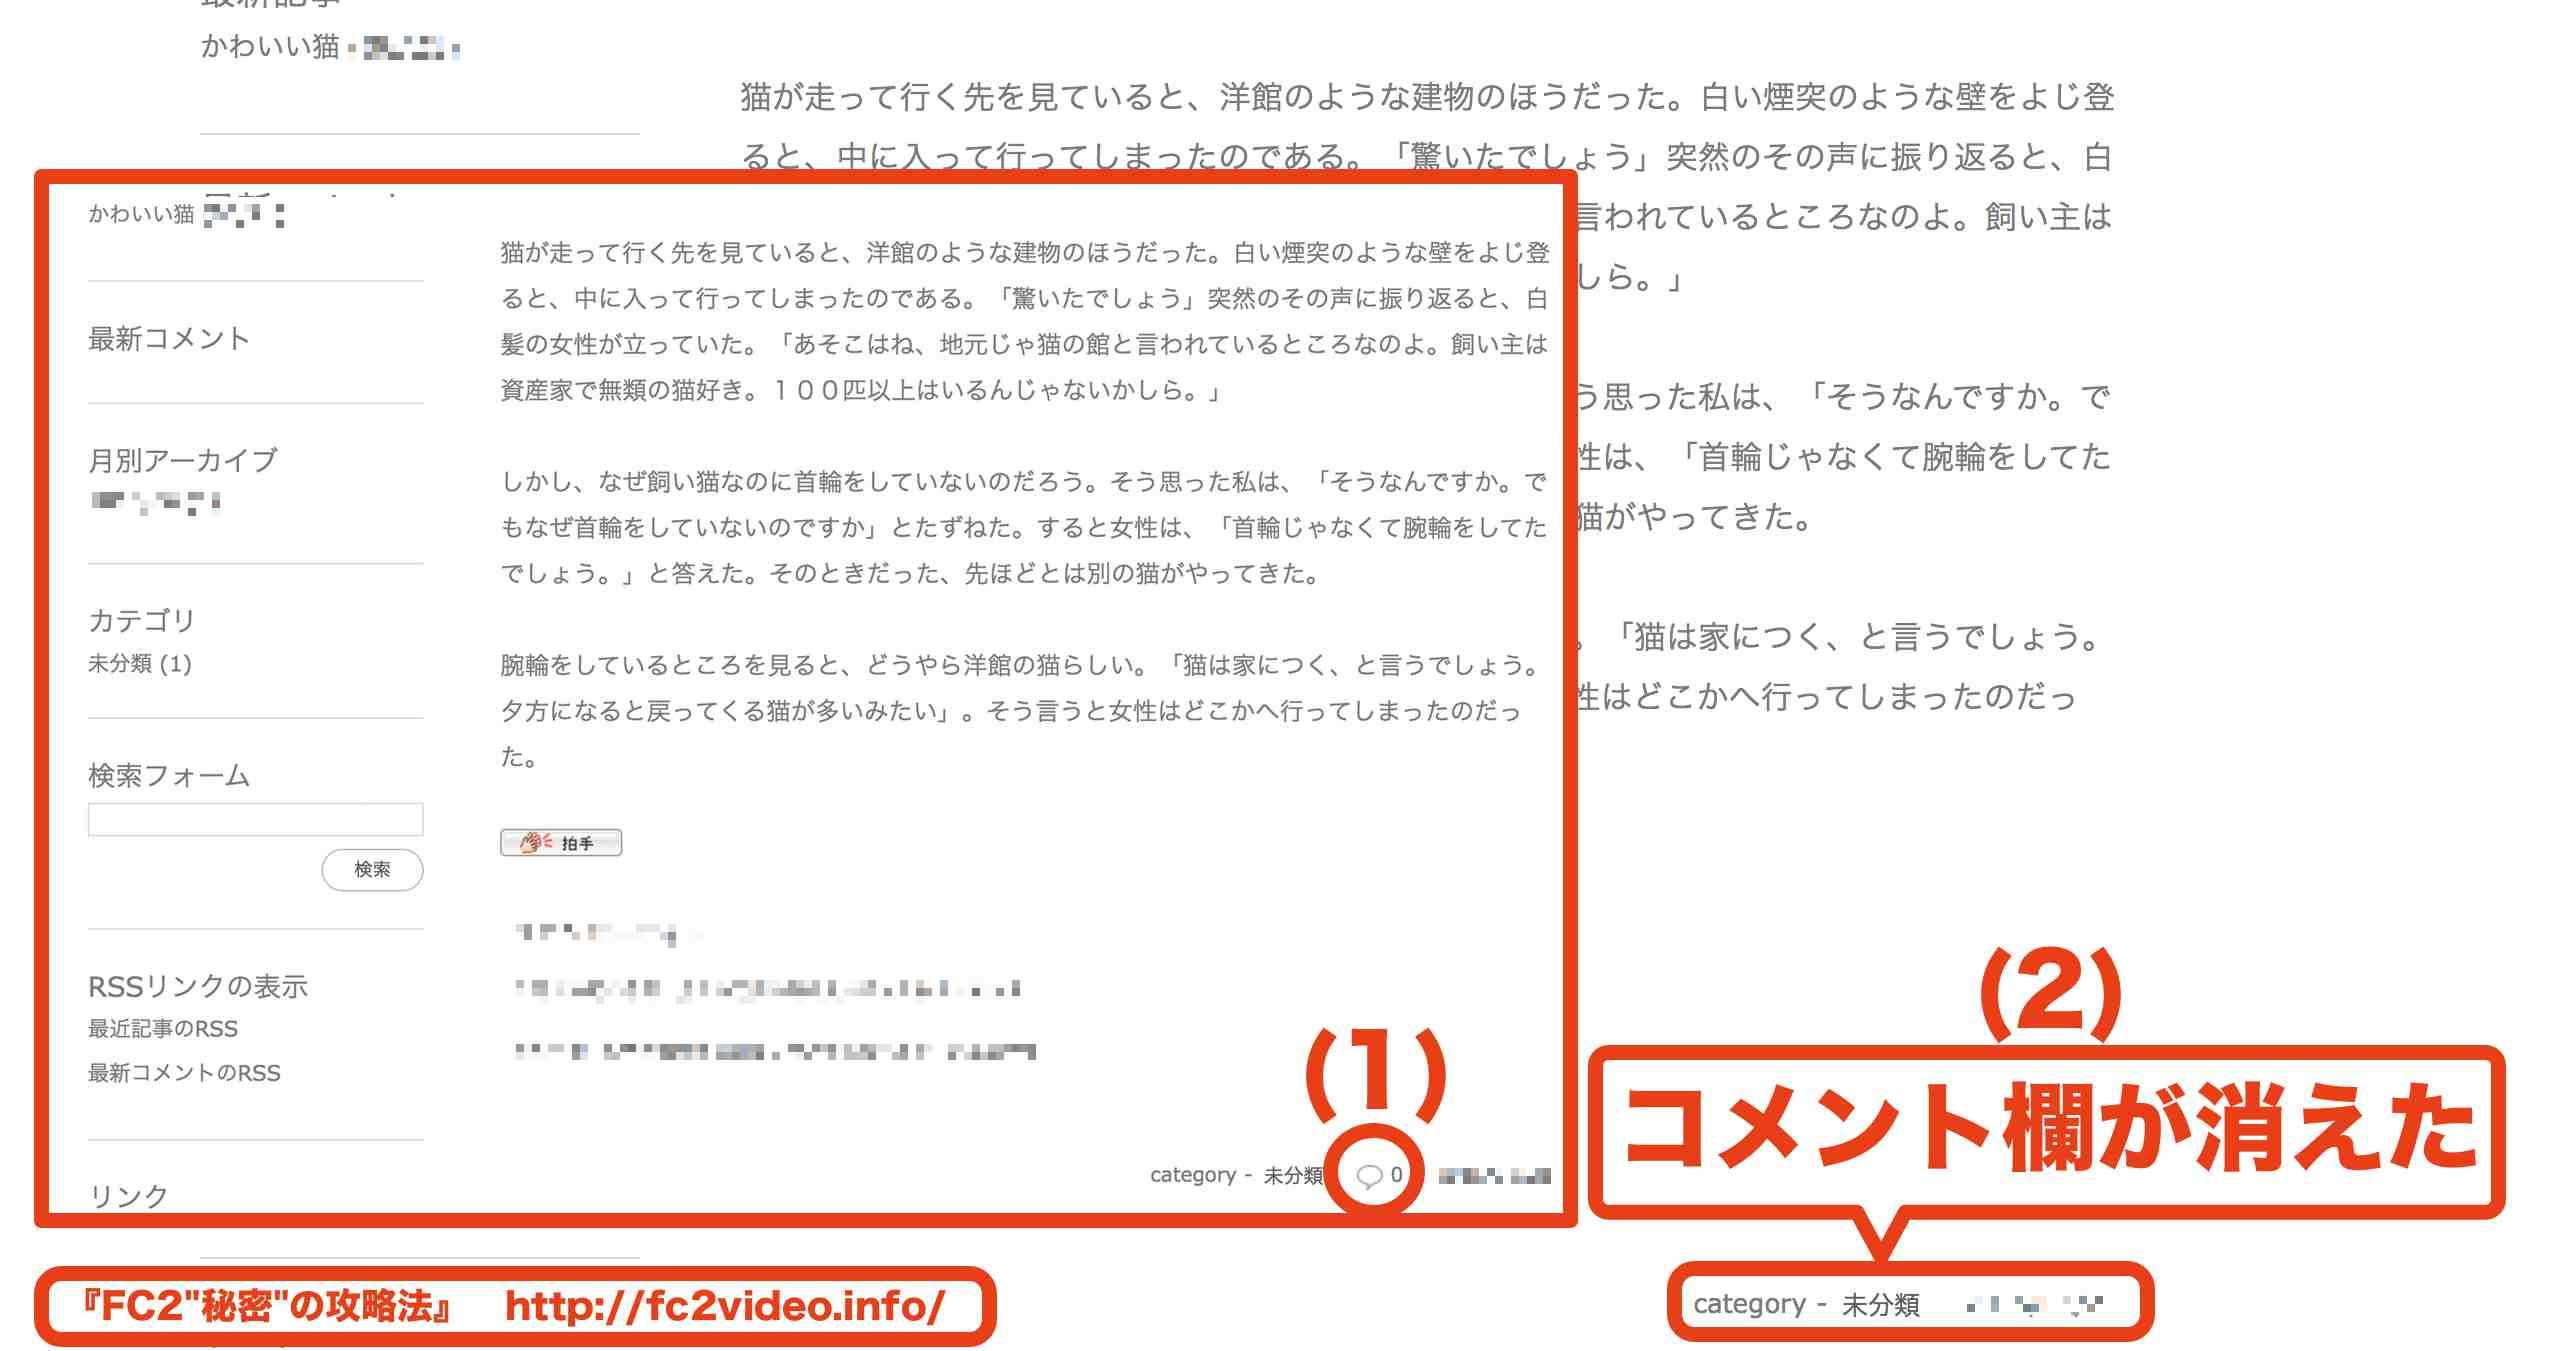 FC2ブログで記事ごとにコメントの可否を設定する方法3